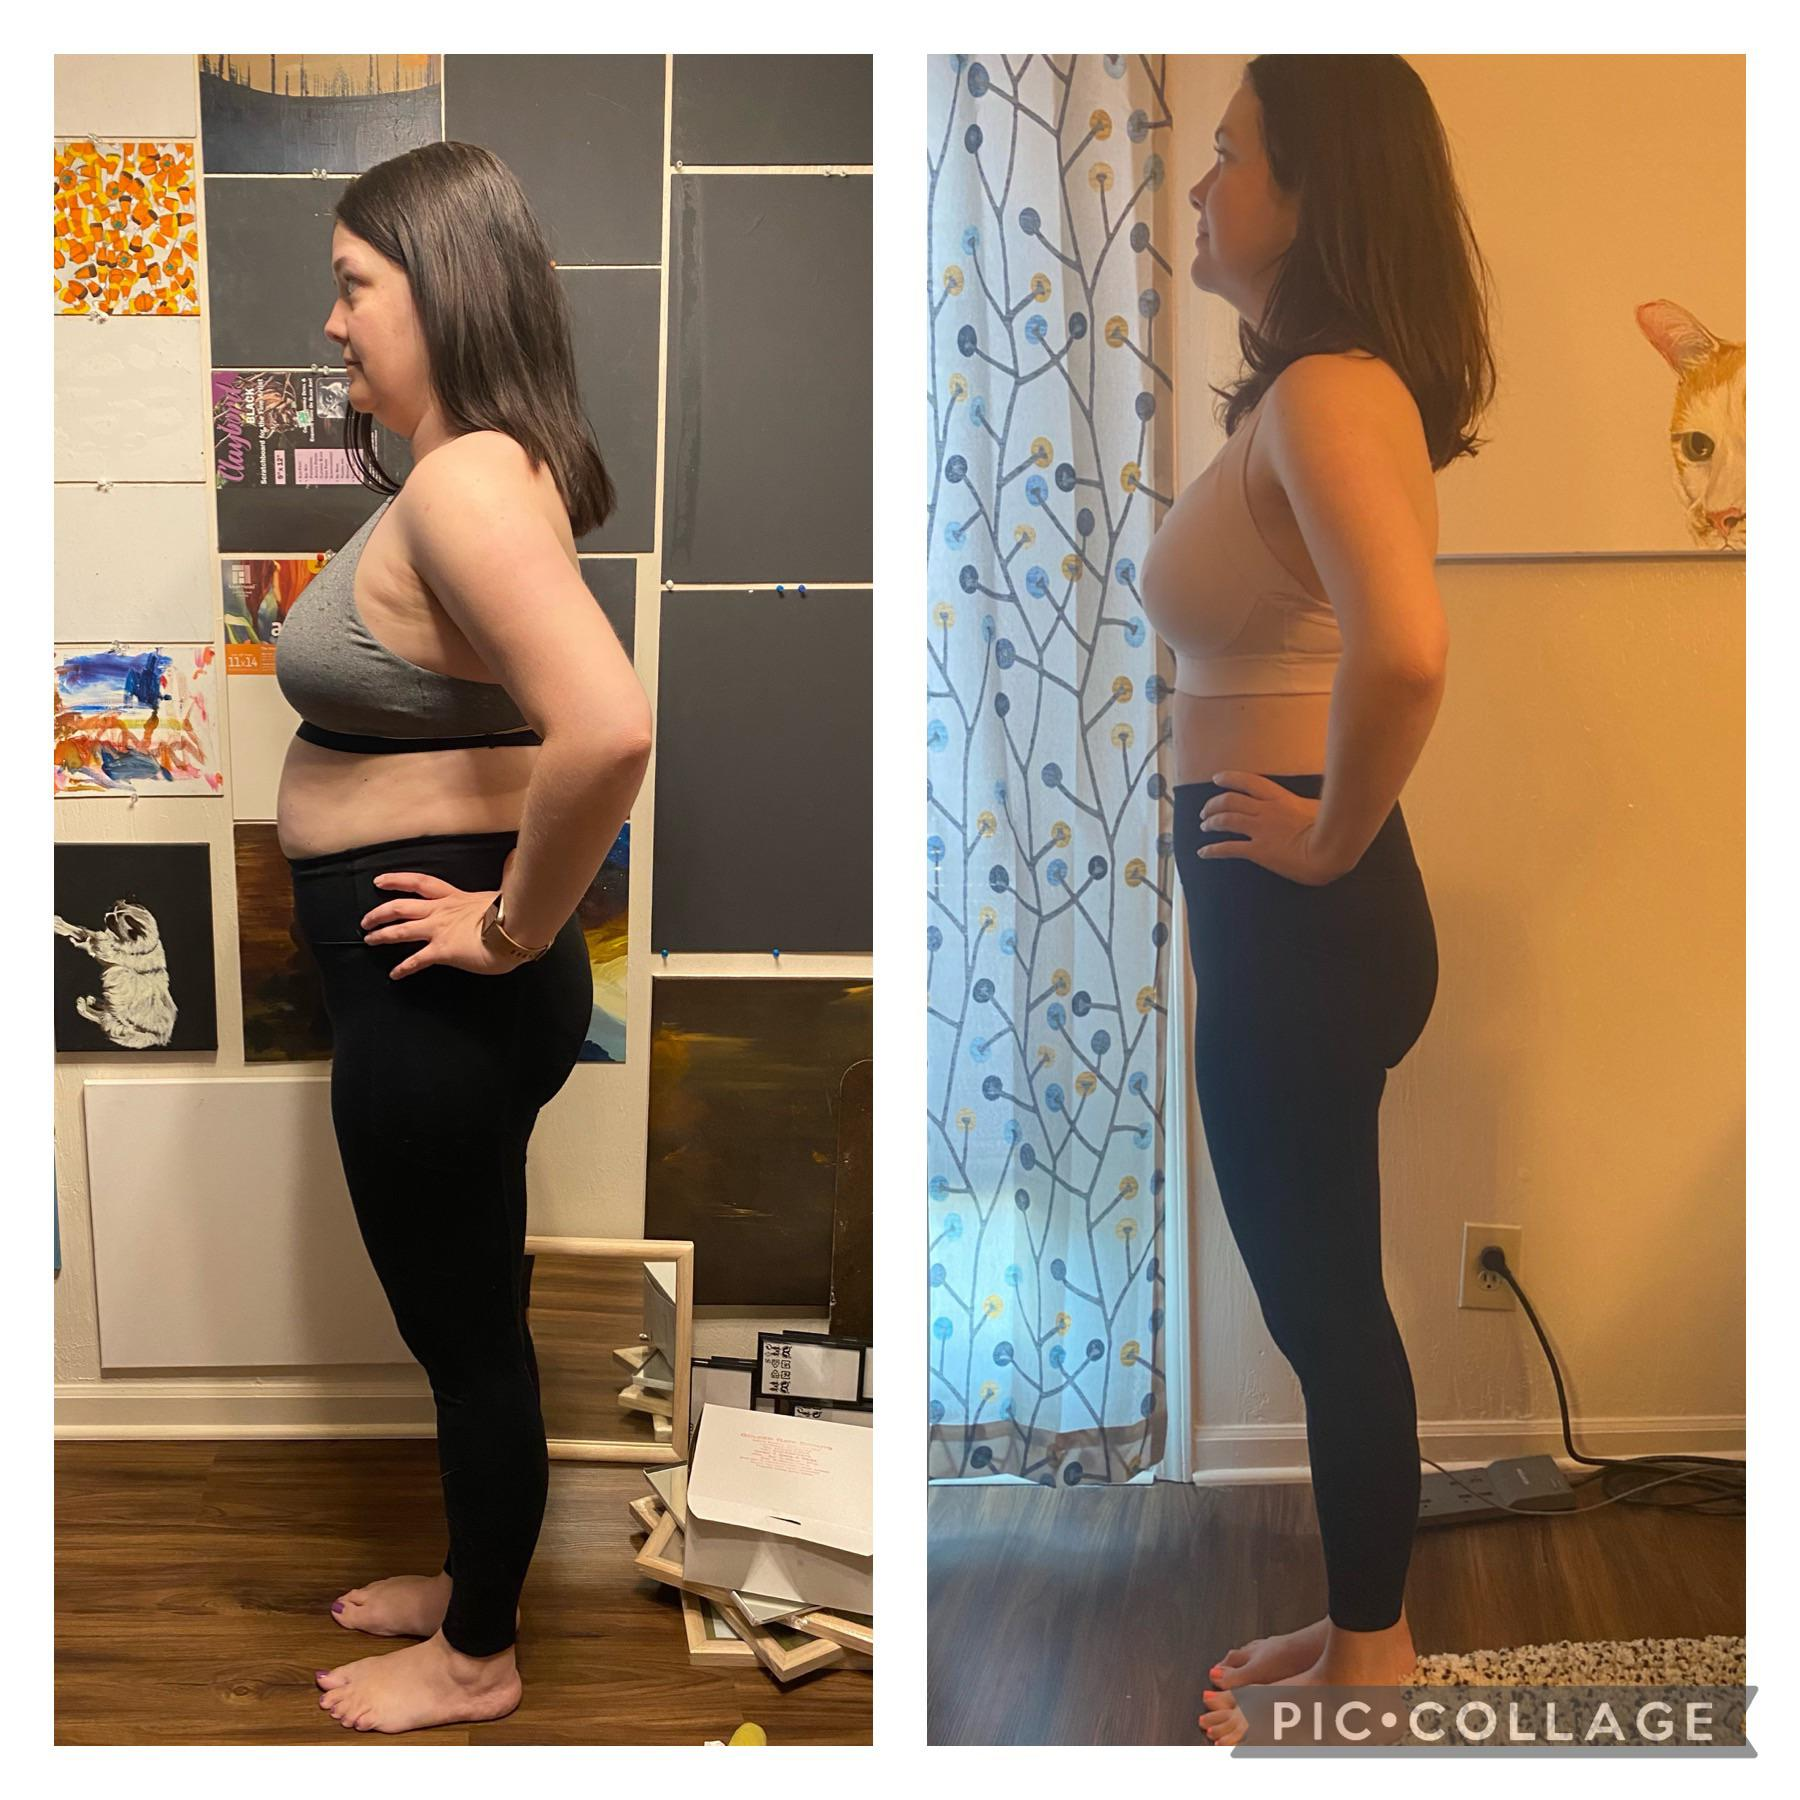 Progress Pics of 36 lbs Weight Loss 5 feet 7 Female 175 lbs to 139 lbs